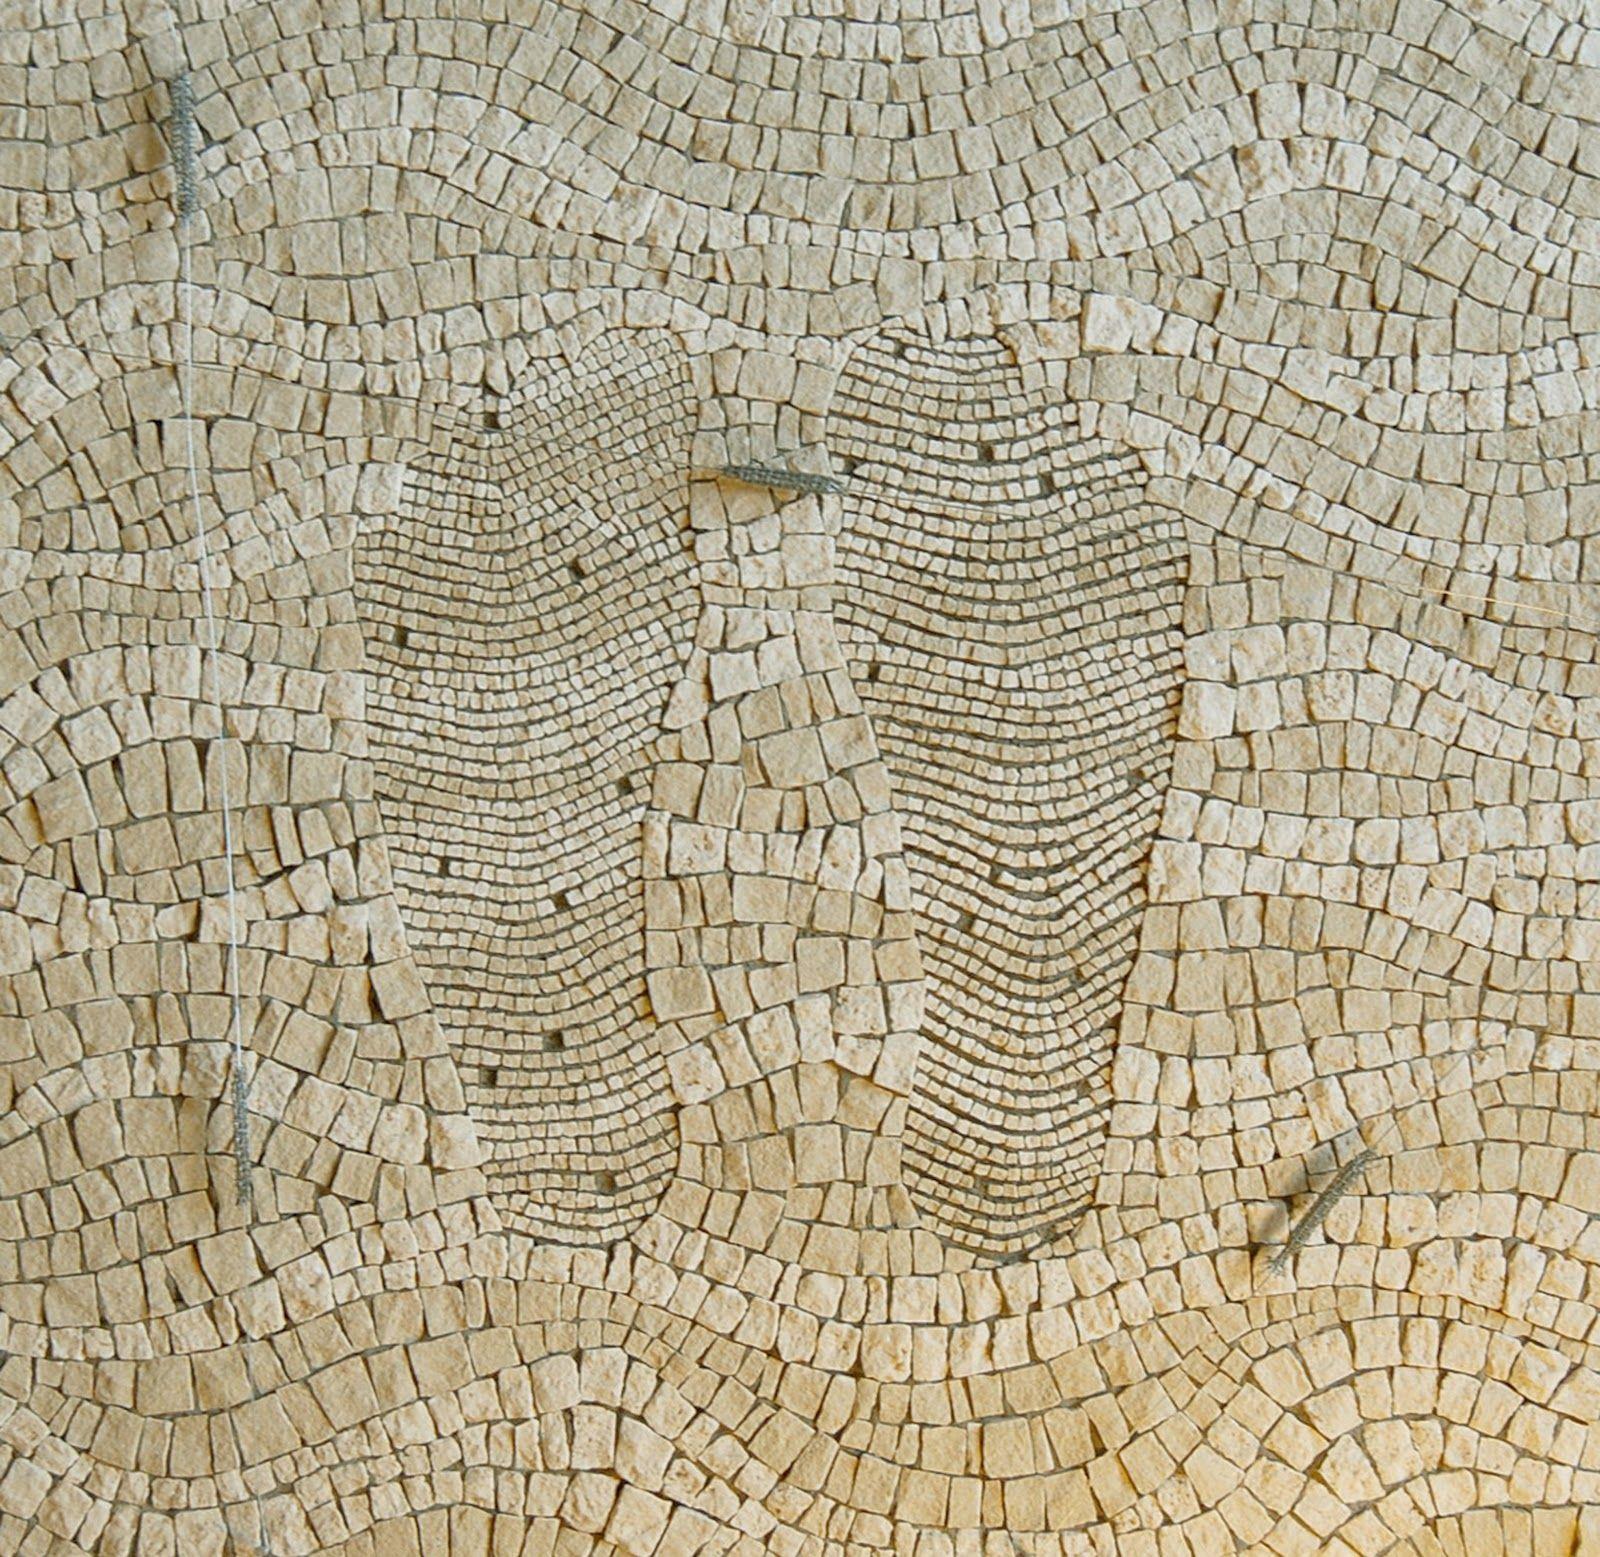 antonella zorzi mosaics weihnachten pinterest mosaik. Black Bedroom Furniture Sets. Home Design Ideas